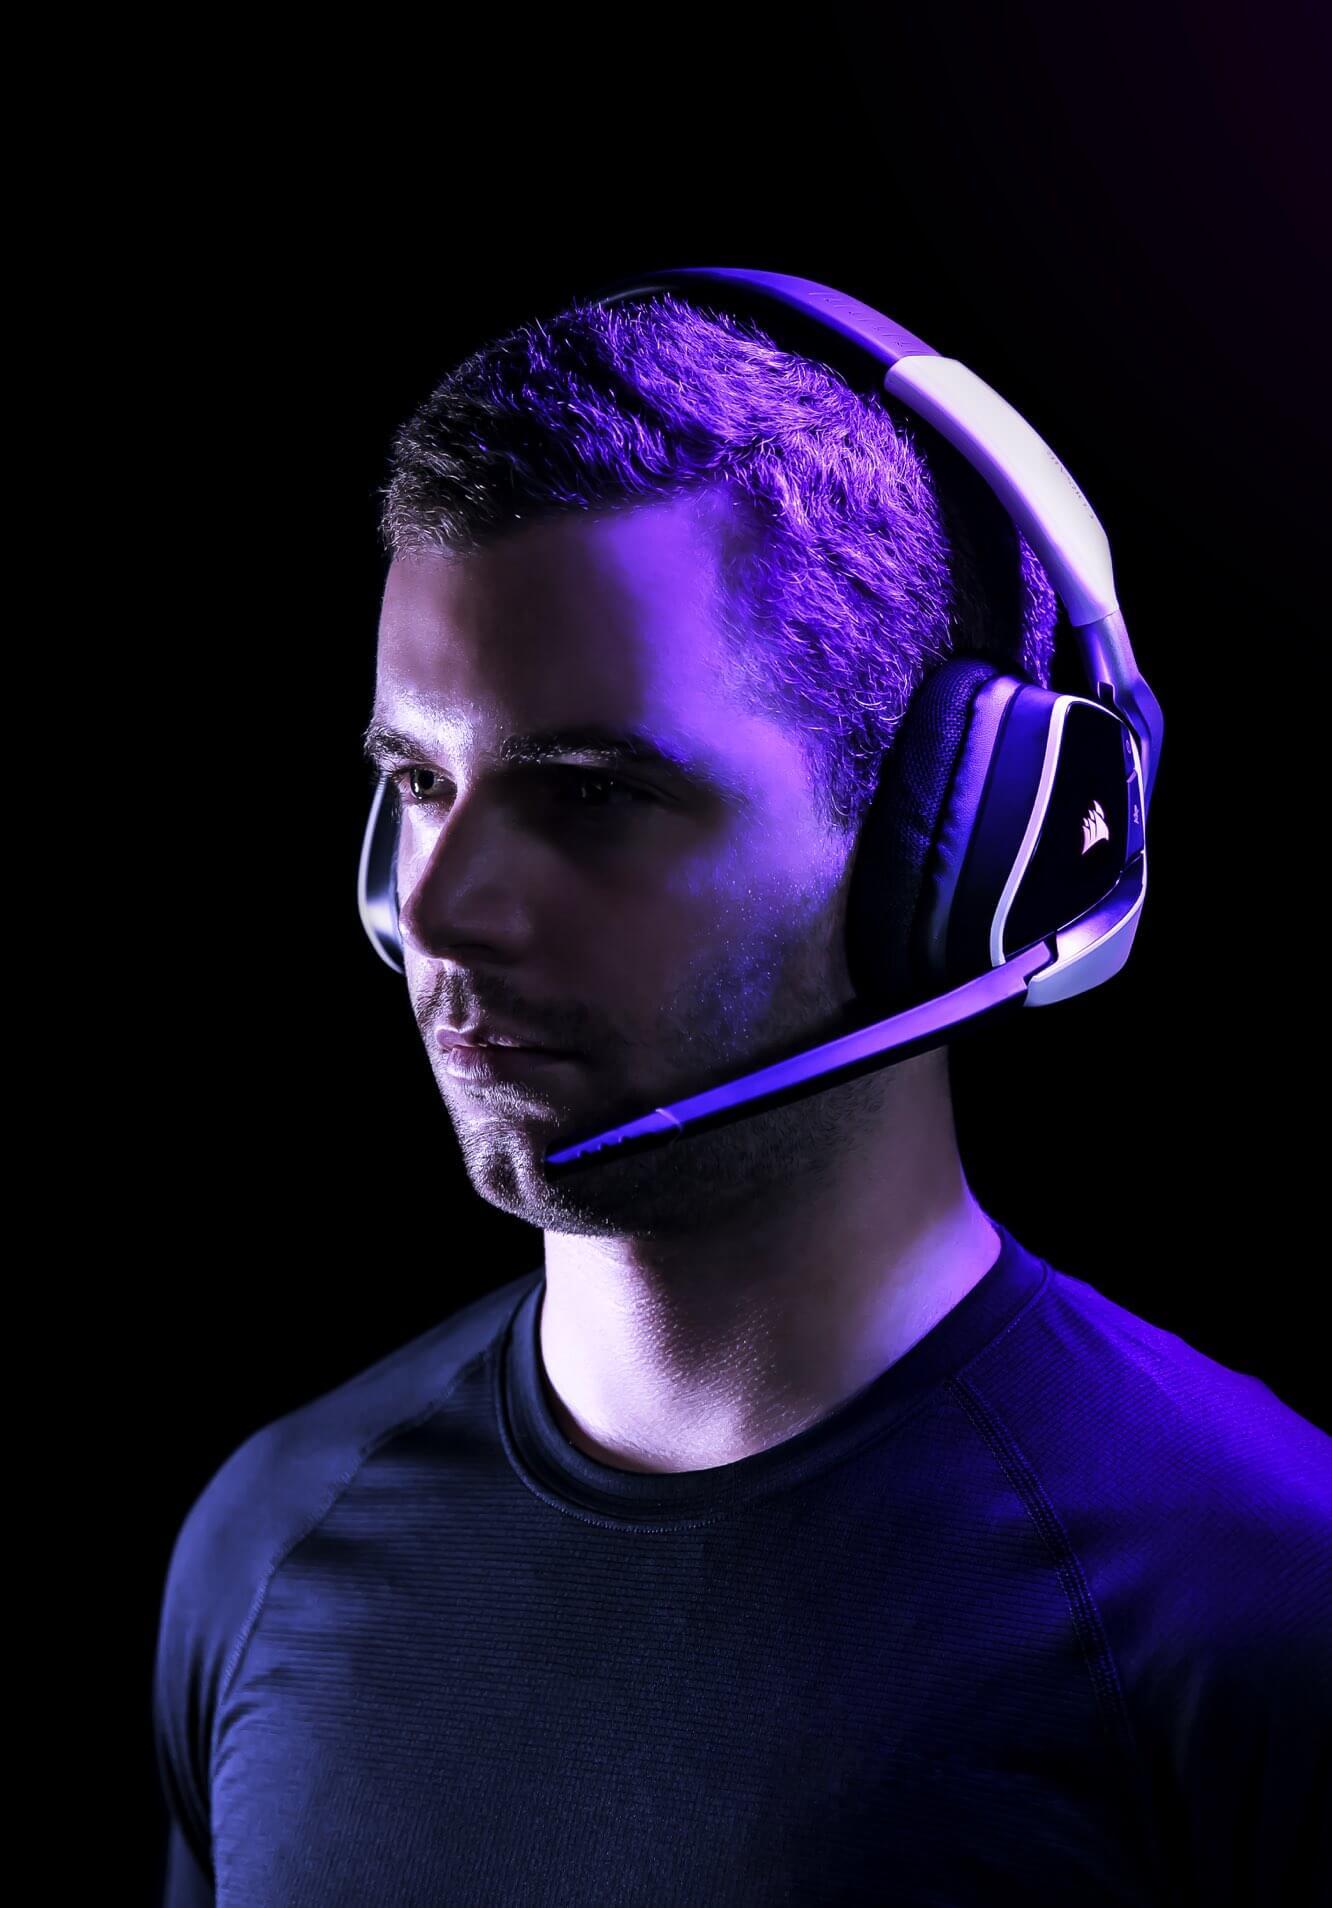 Tai nghe chơi game Corsair VOID RGB ELITE USB 7.1 Carbon - CA-9011203-AP có thiết kế đeo thoải mái